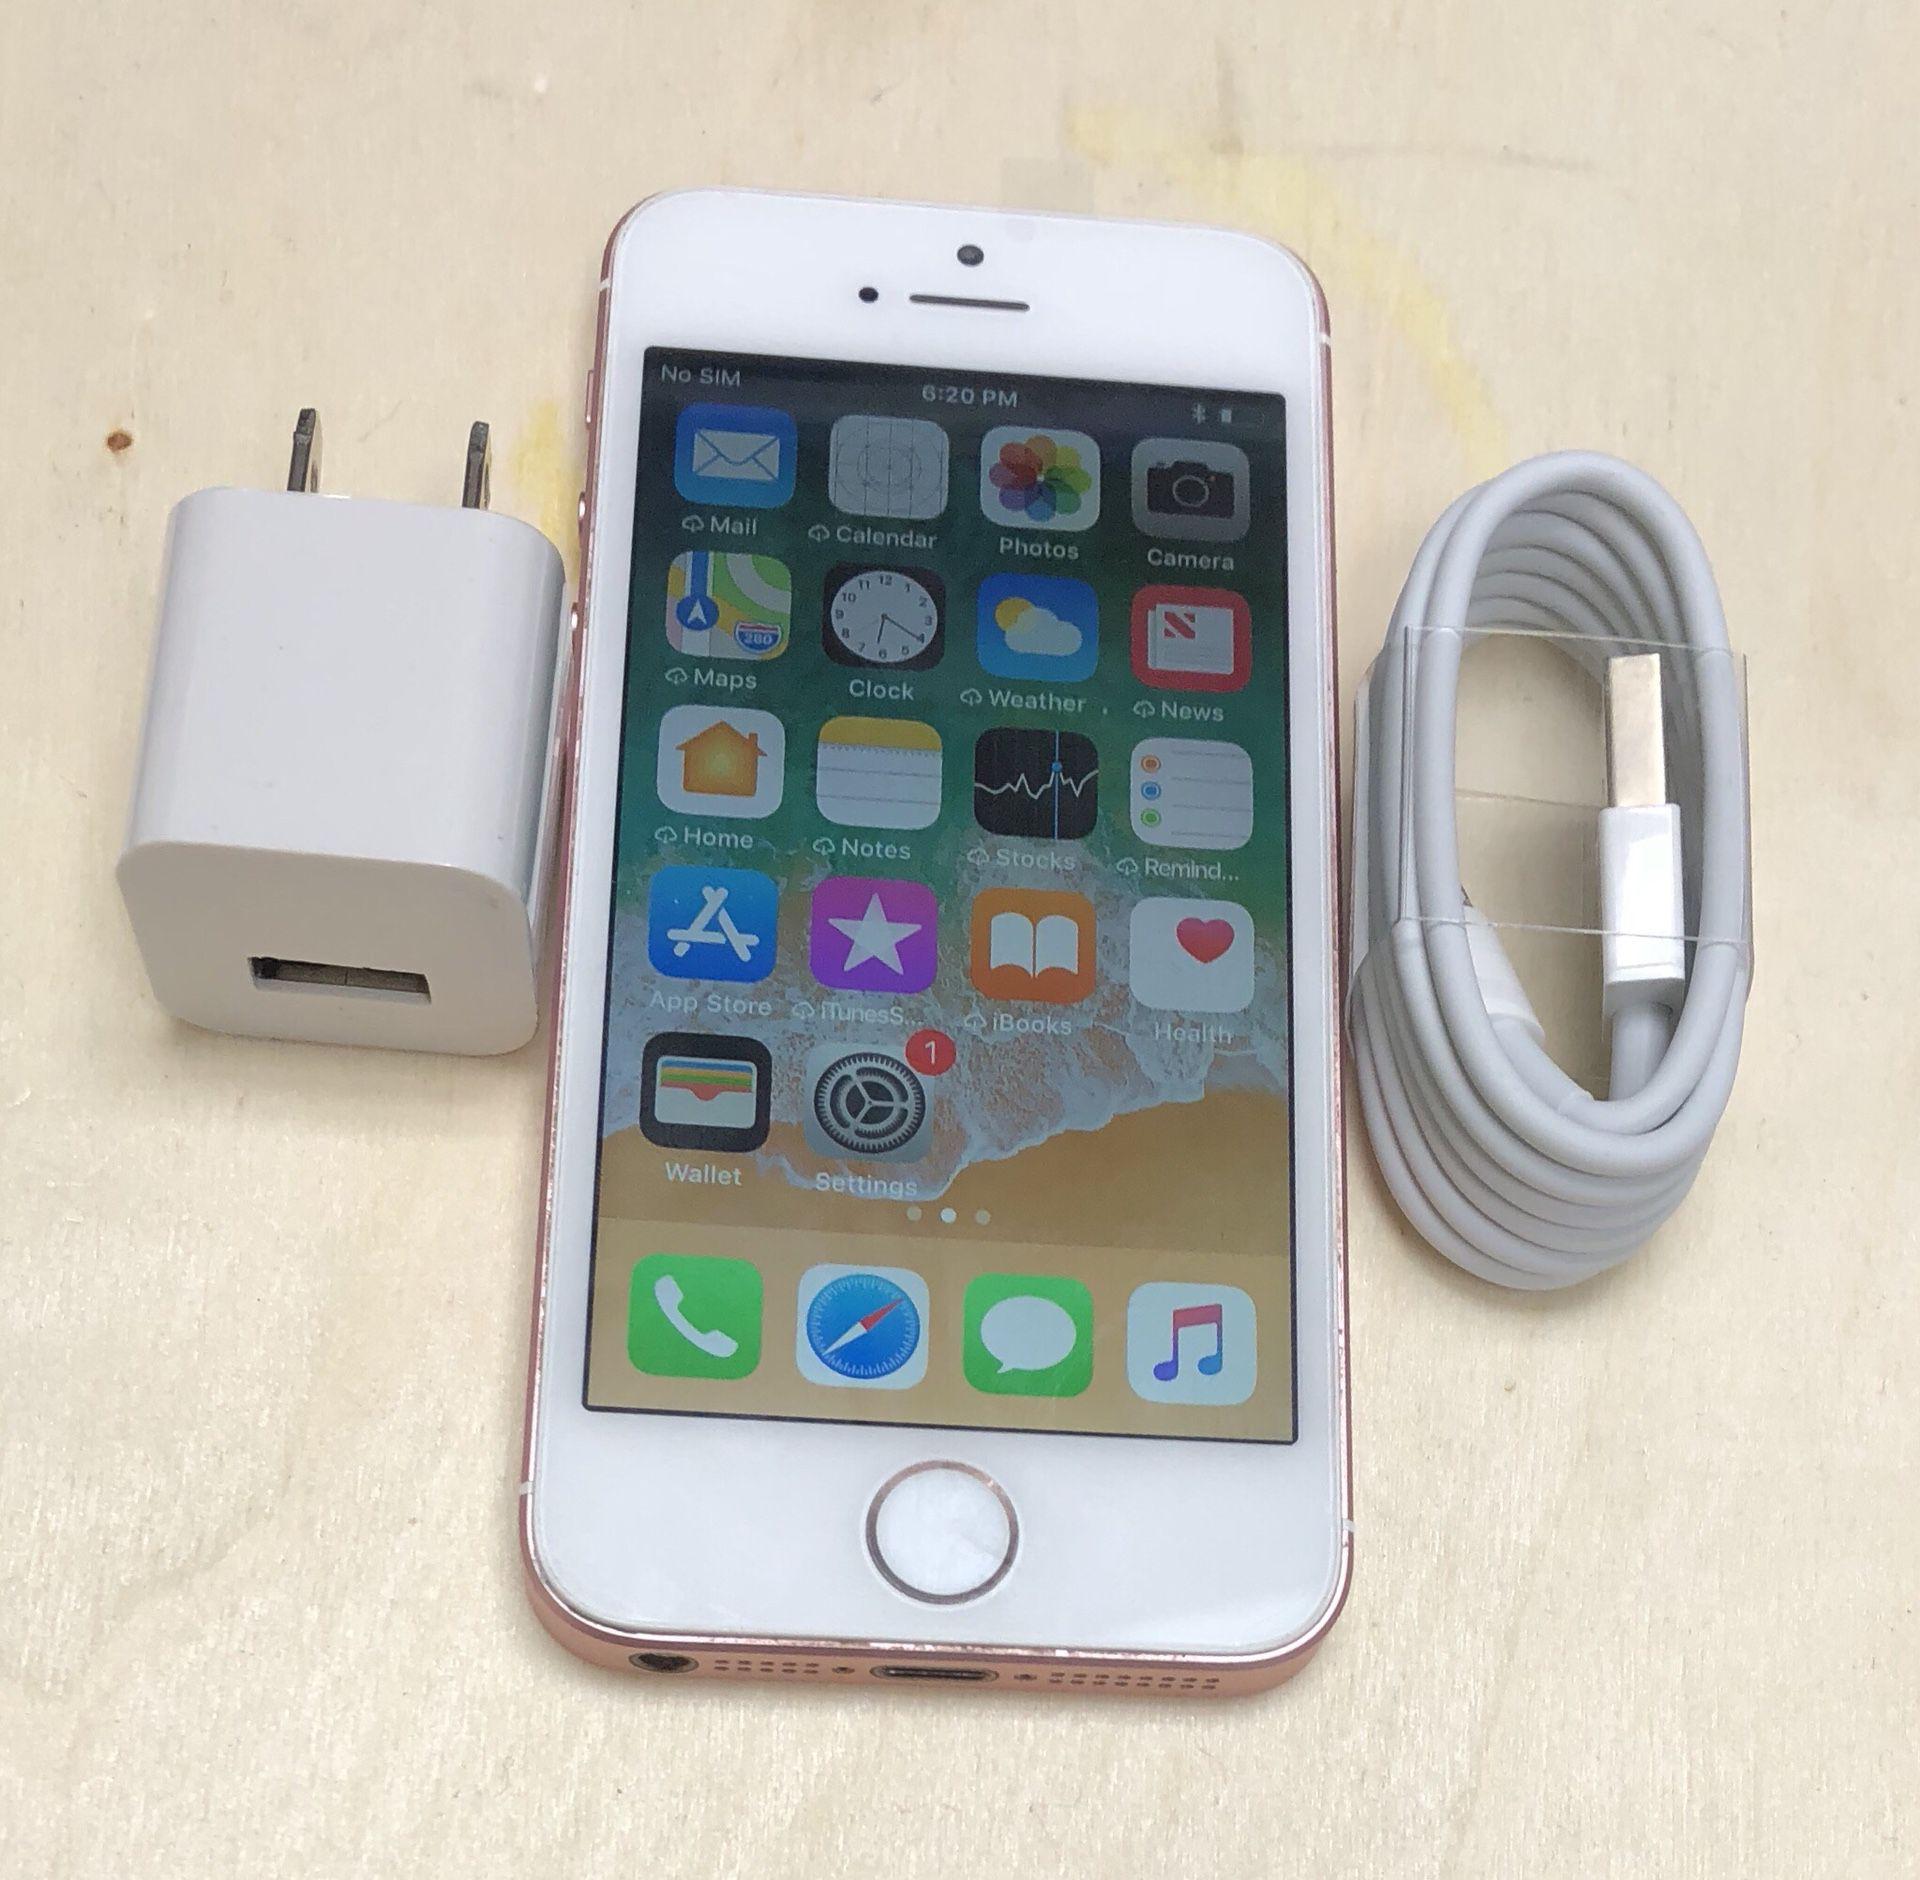 İPhone SE 16GB Factory Unlocked